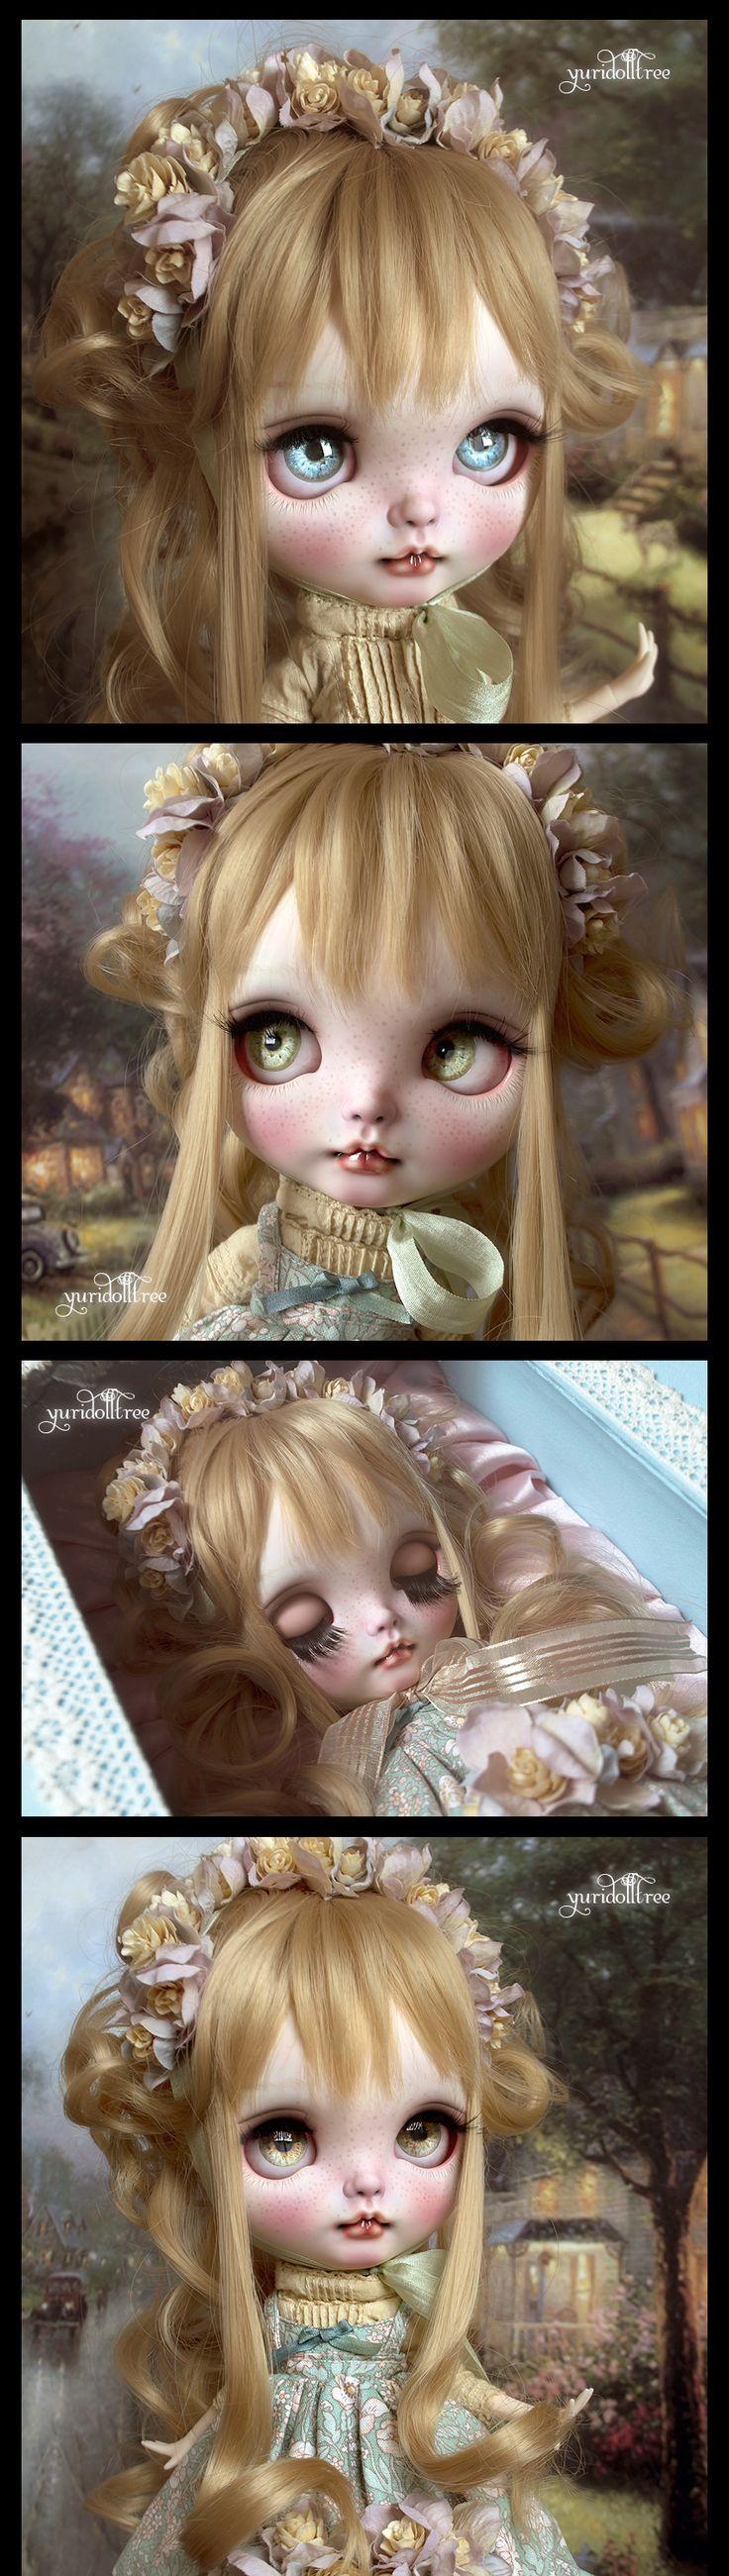 Custom Blythe Dolls: Yuridolltree Custom Blythe - A Rinkya Blog